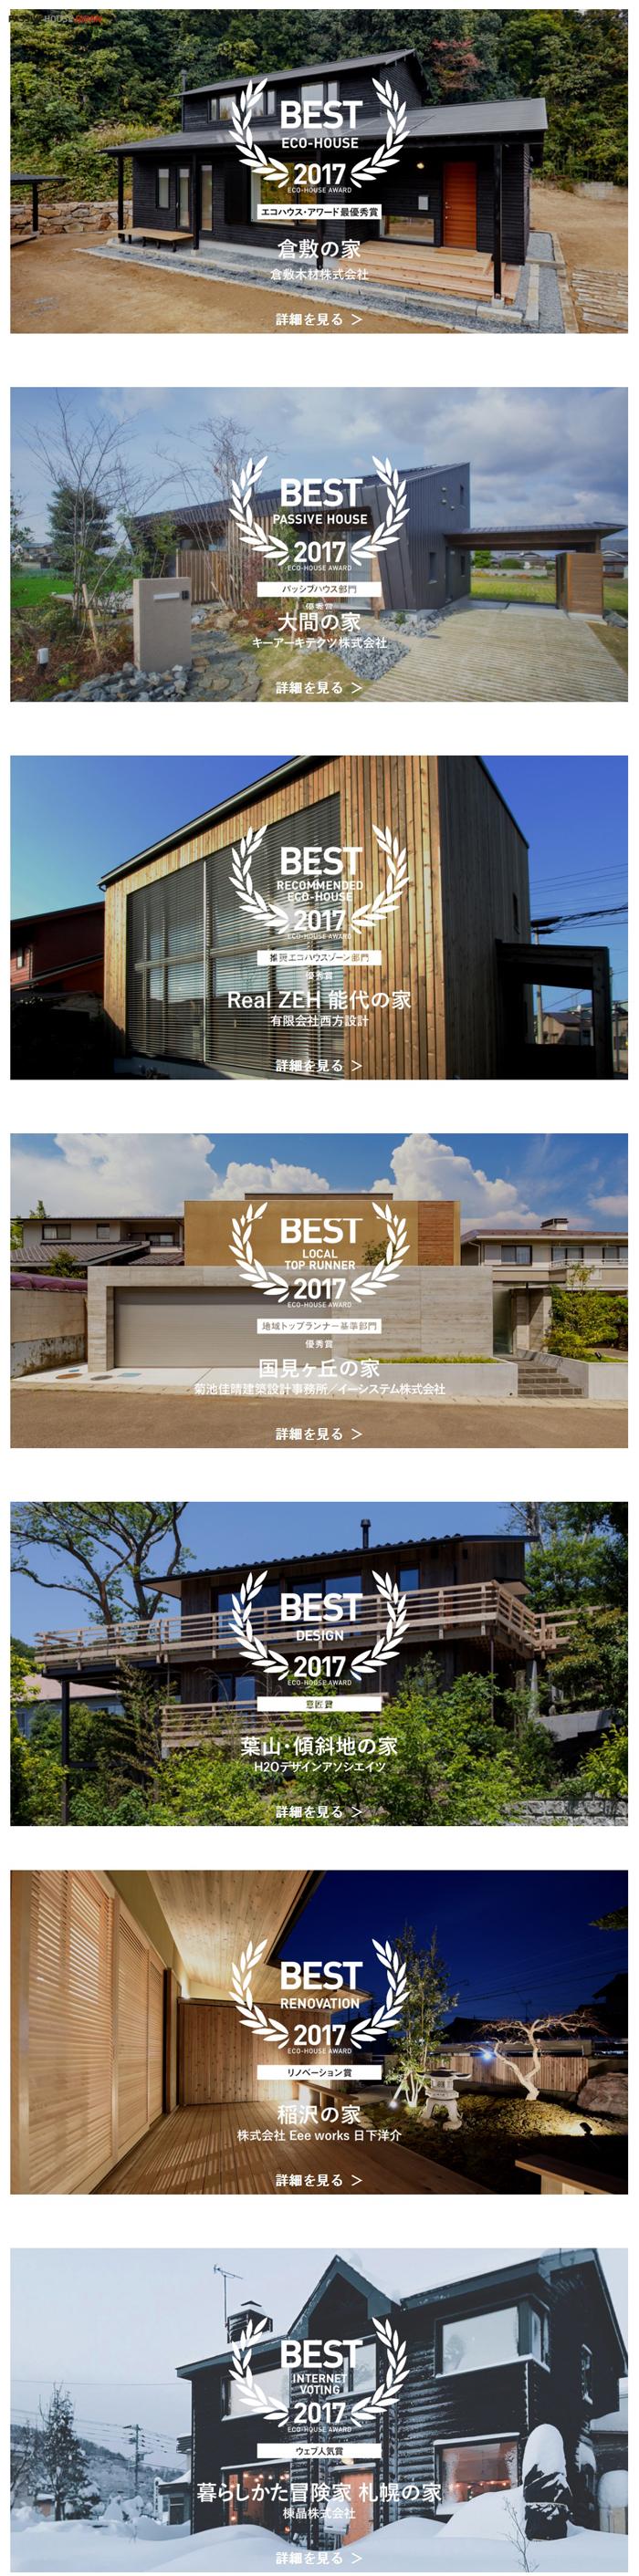 bestphj2017.jpg